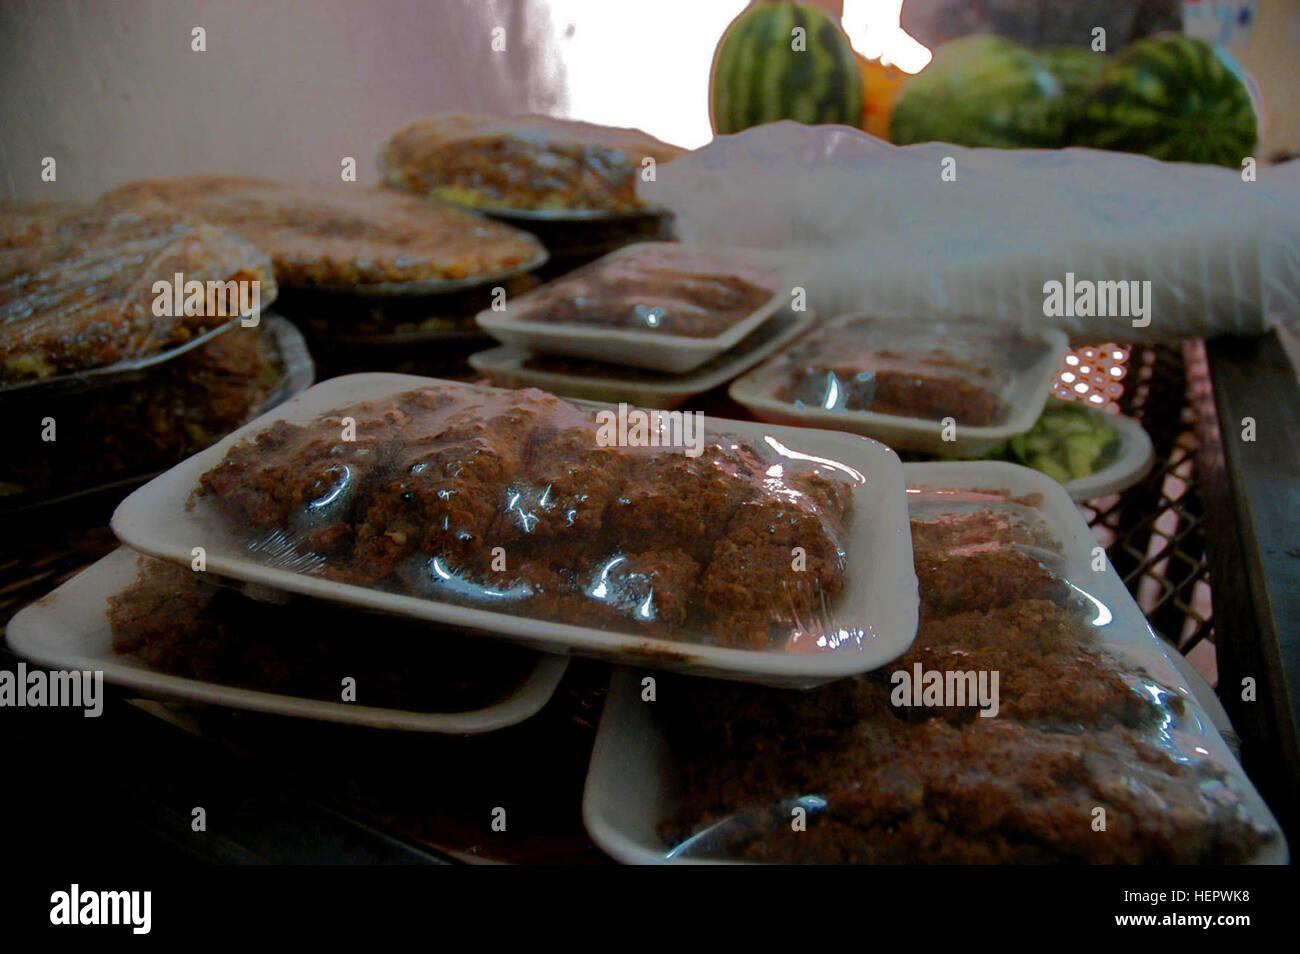 Most Inspiring Cuisine Eid Al-Fitr Feast - detainees-treated-to-traditional-eid-al-fitr-feast-119448-HEPWK8  Graphic_369344 .jpg